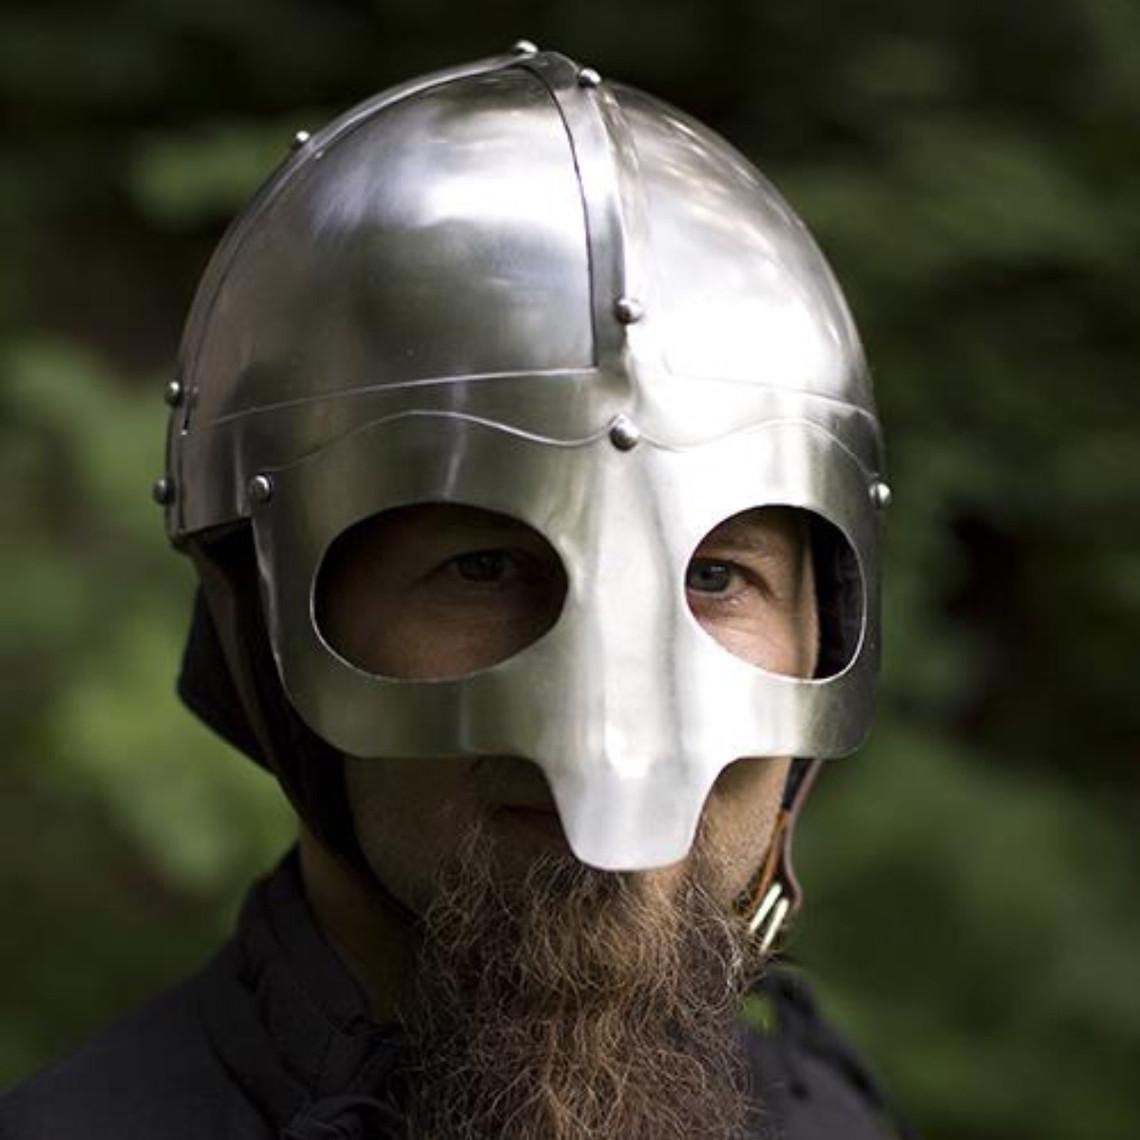 Epic Armoury Wikinger Spektakelhelm Jormungand